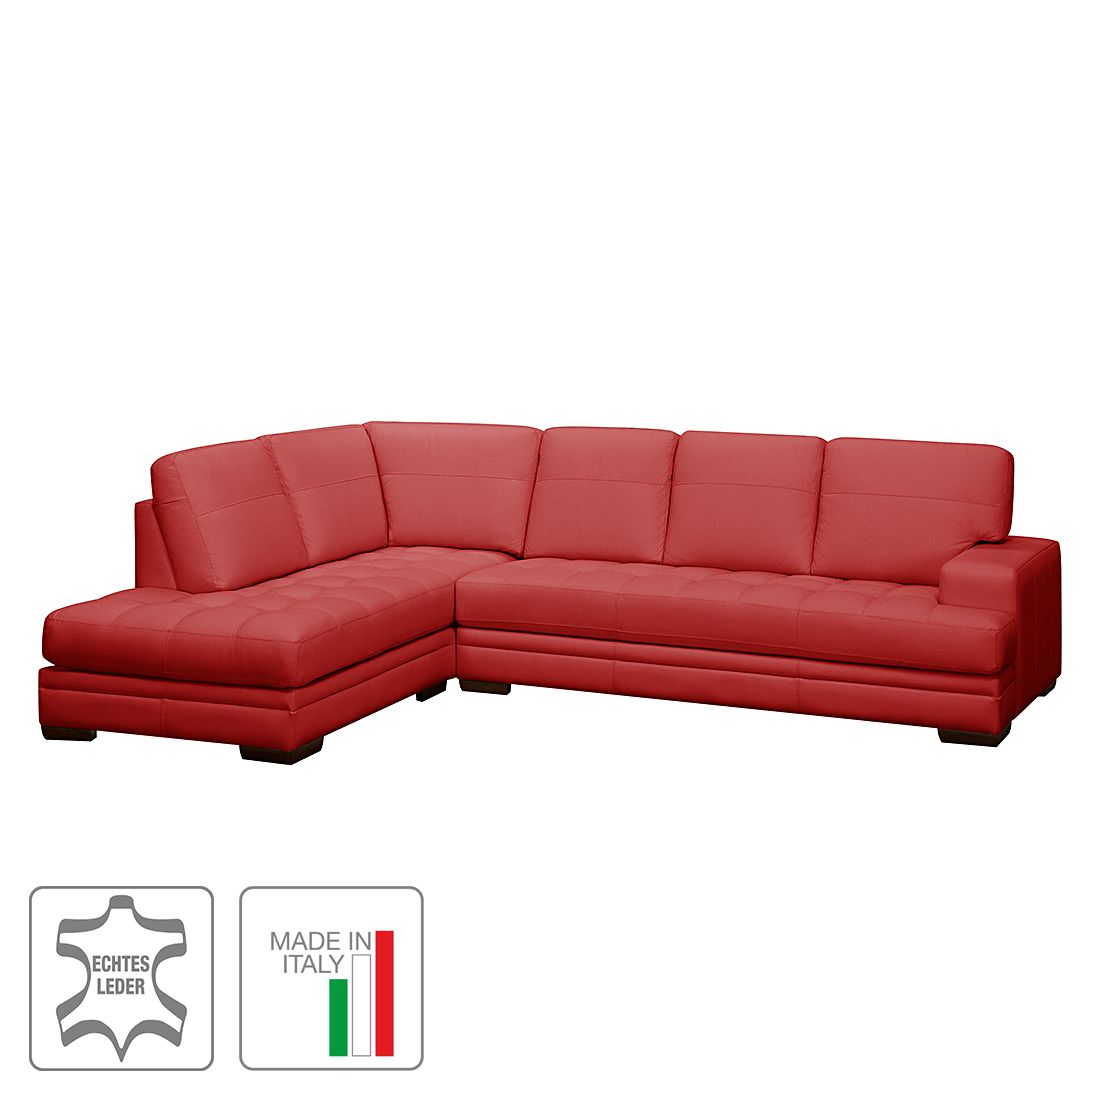 ecksofa trapuntato echtleder longchair ottomane davorstehend links rot trend italiano kaufen. Black Bedroom Furniture Sets. Home Design Ideas